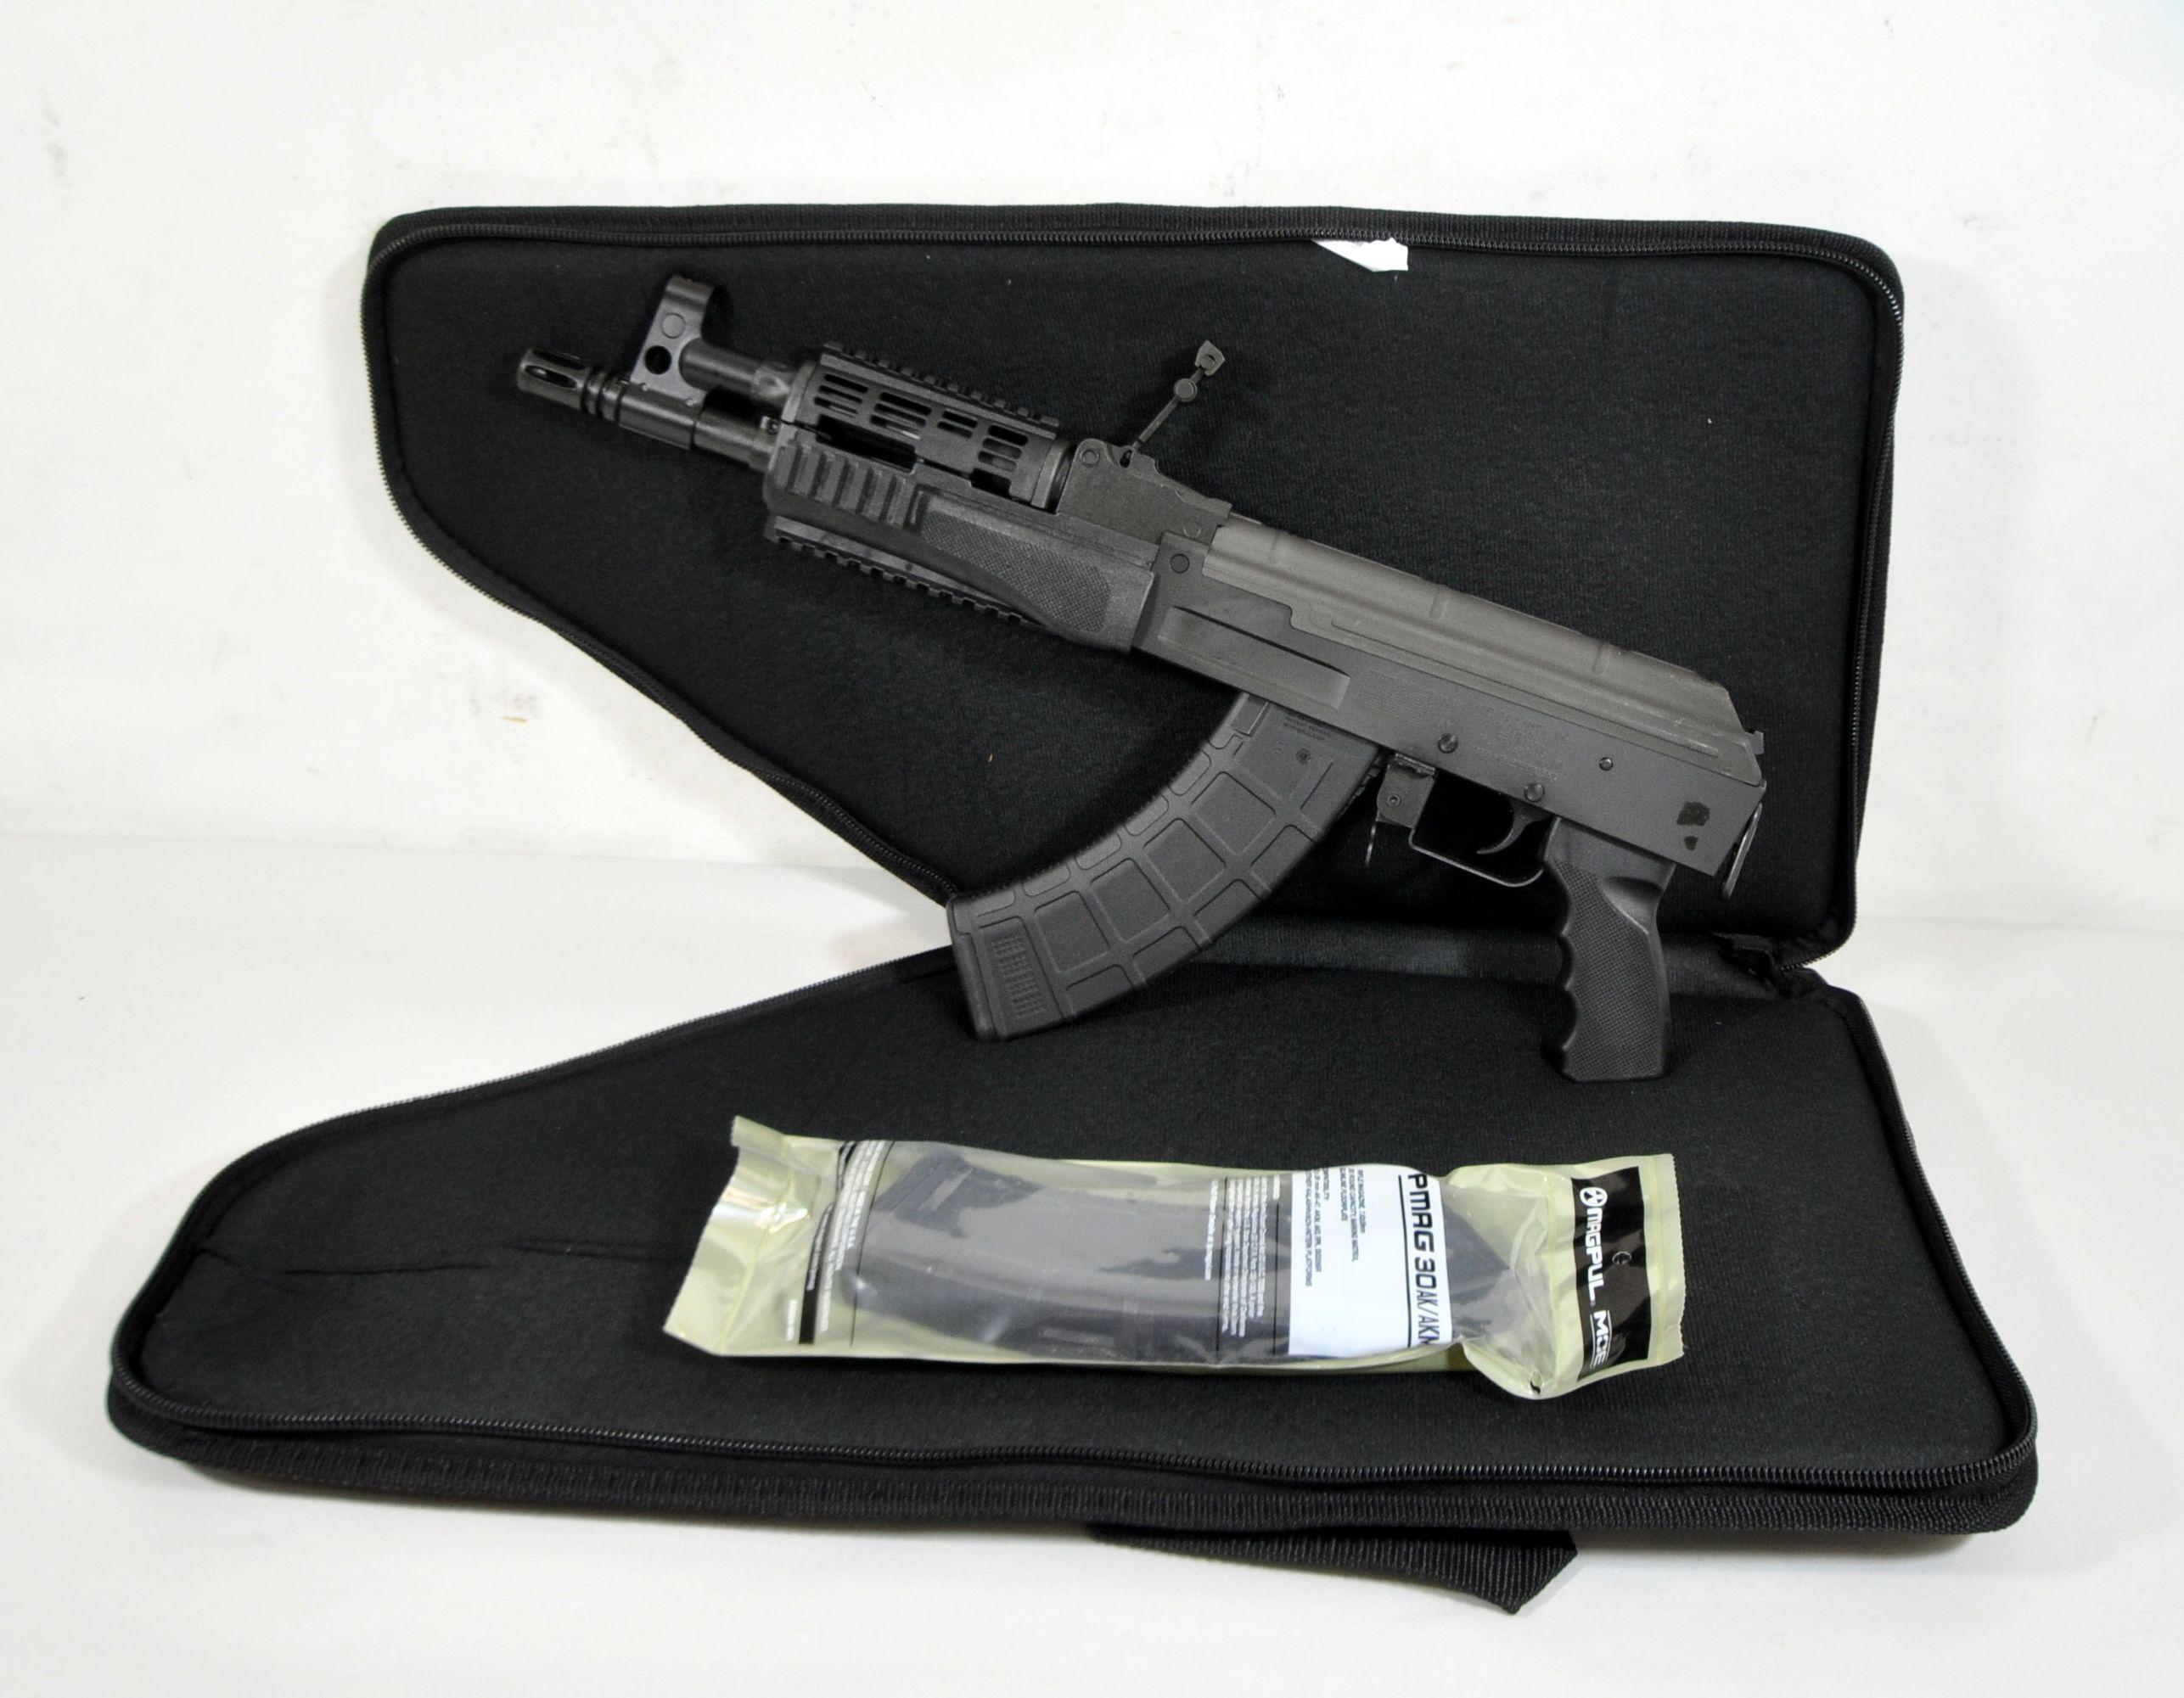 Case Blue Mmp : Cai c39 centurion pistol 7.62x39 w case [new in box] $699.99 mmp